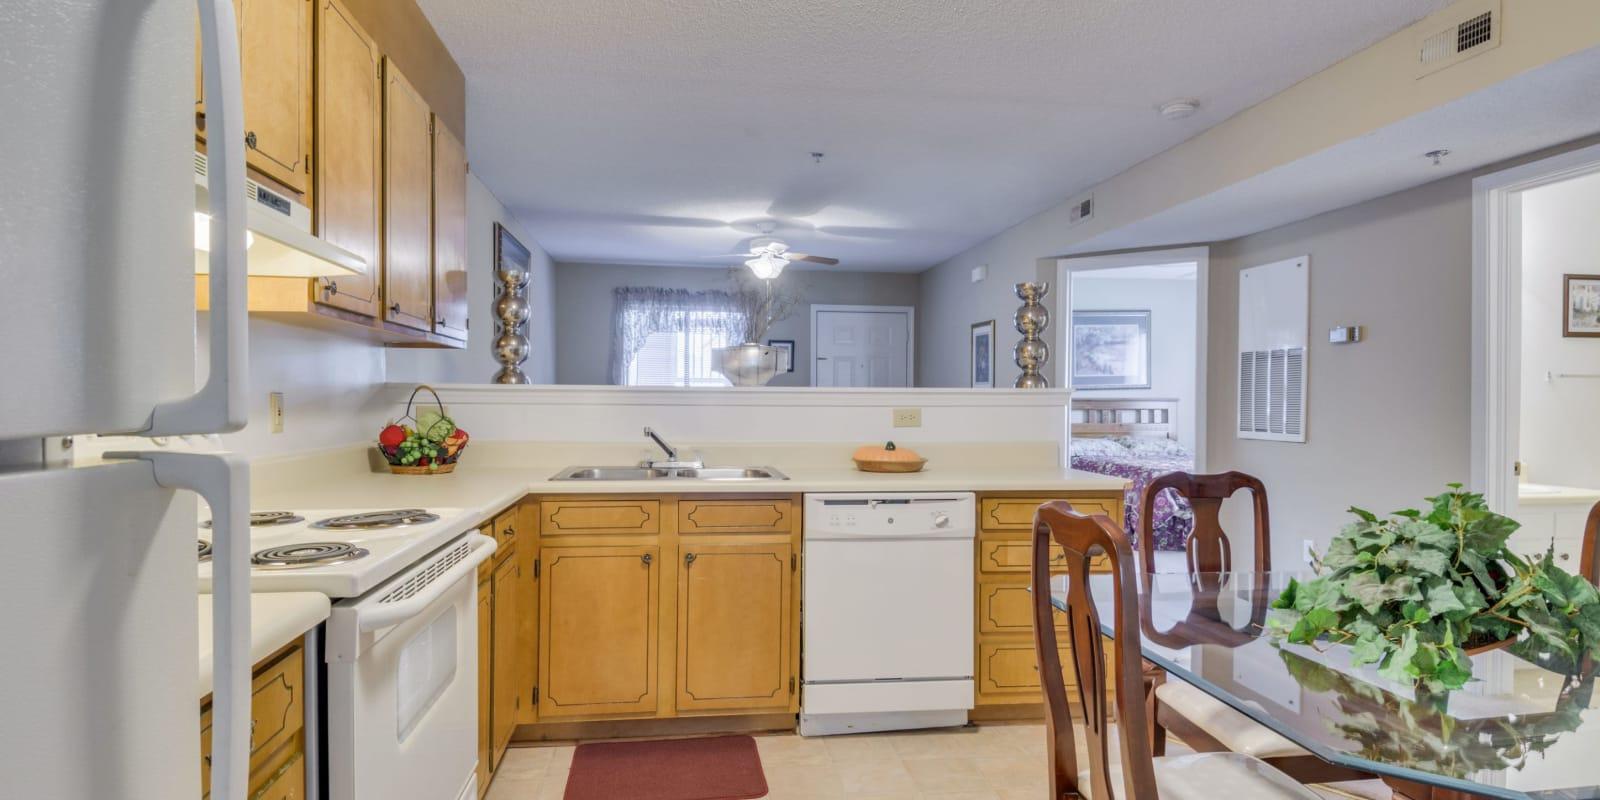 Kitchen with vinyl flooring at Woodbrook Apartment Homes in Monroe, North Carolina